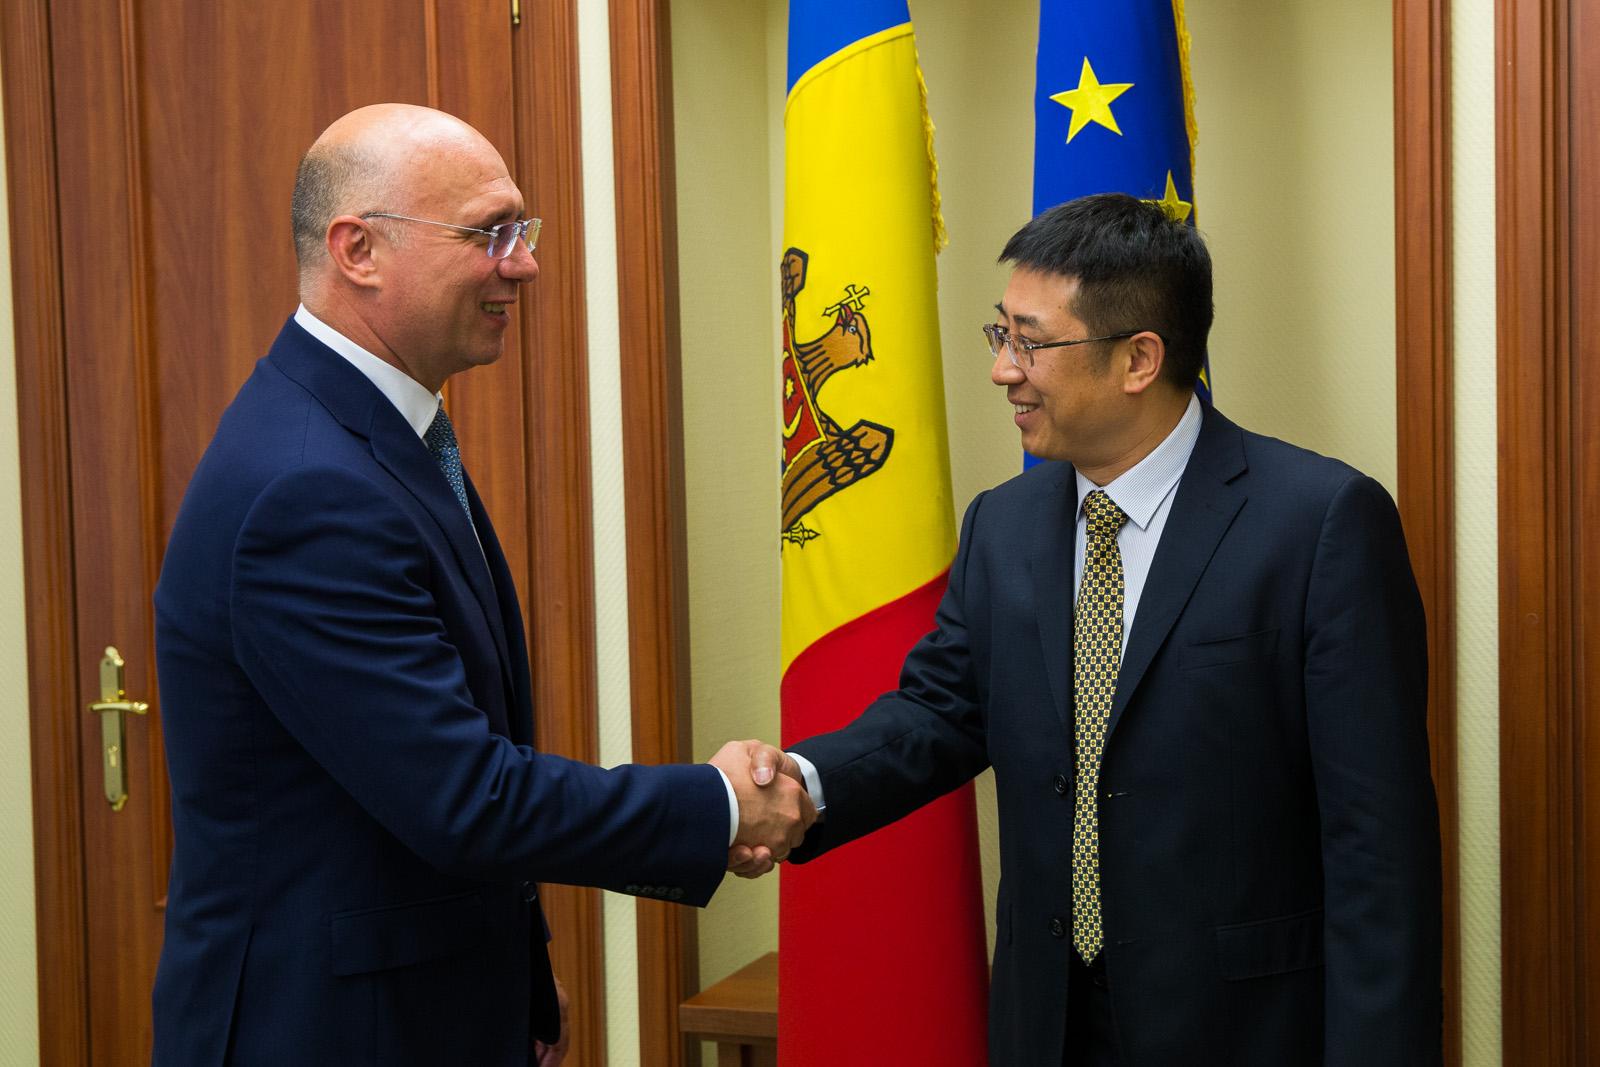 relatia moldova china, pavel filip discuta cu oamenii de afaceri straini, pdm, economia nationala